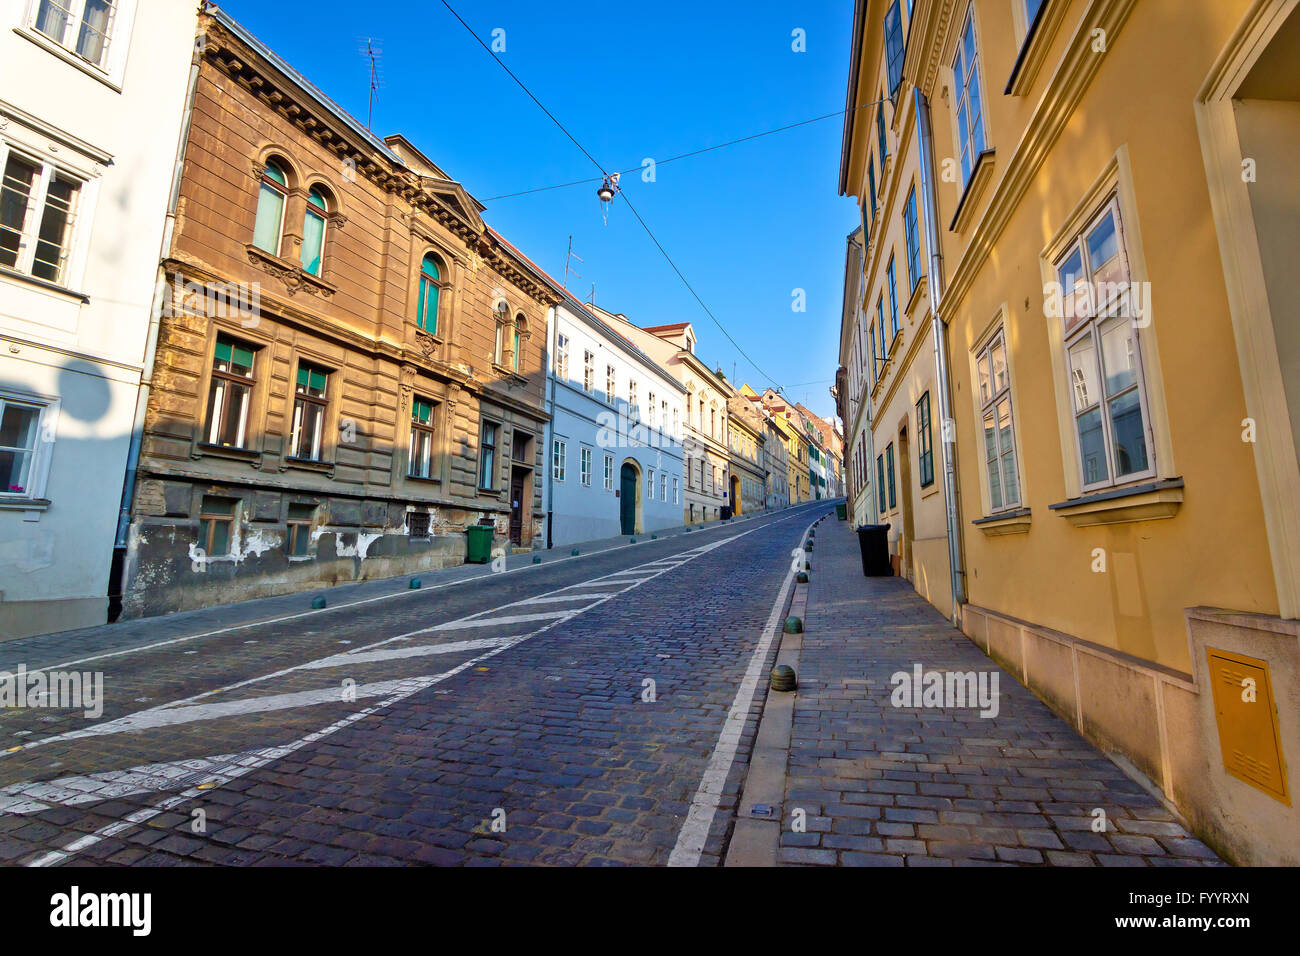 Old Mesnicka street in Zagreb upper town Stock Photo